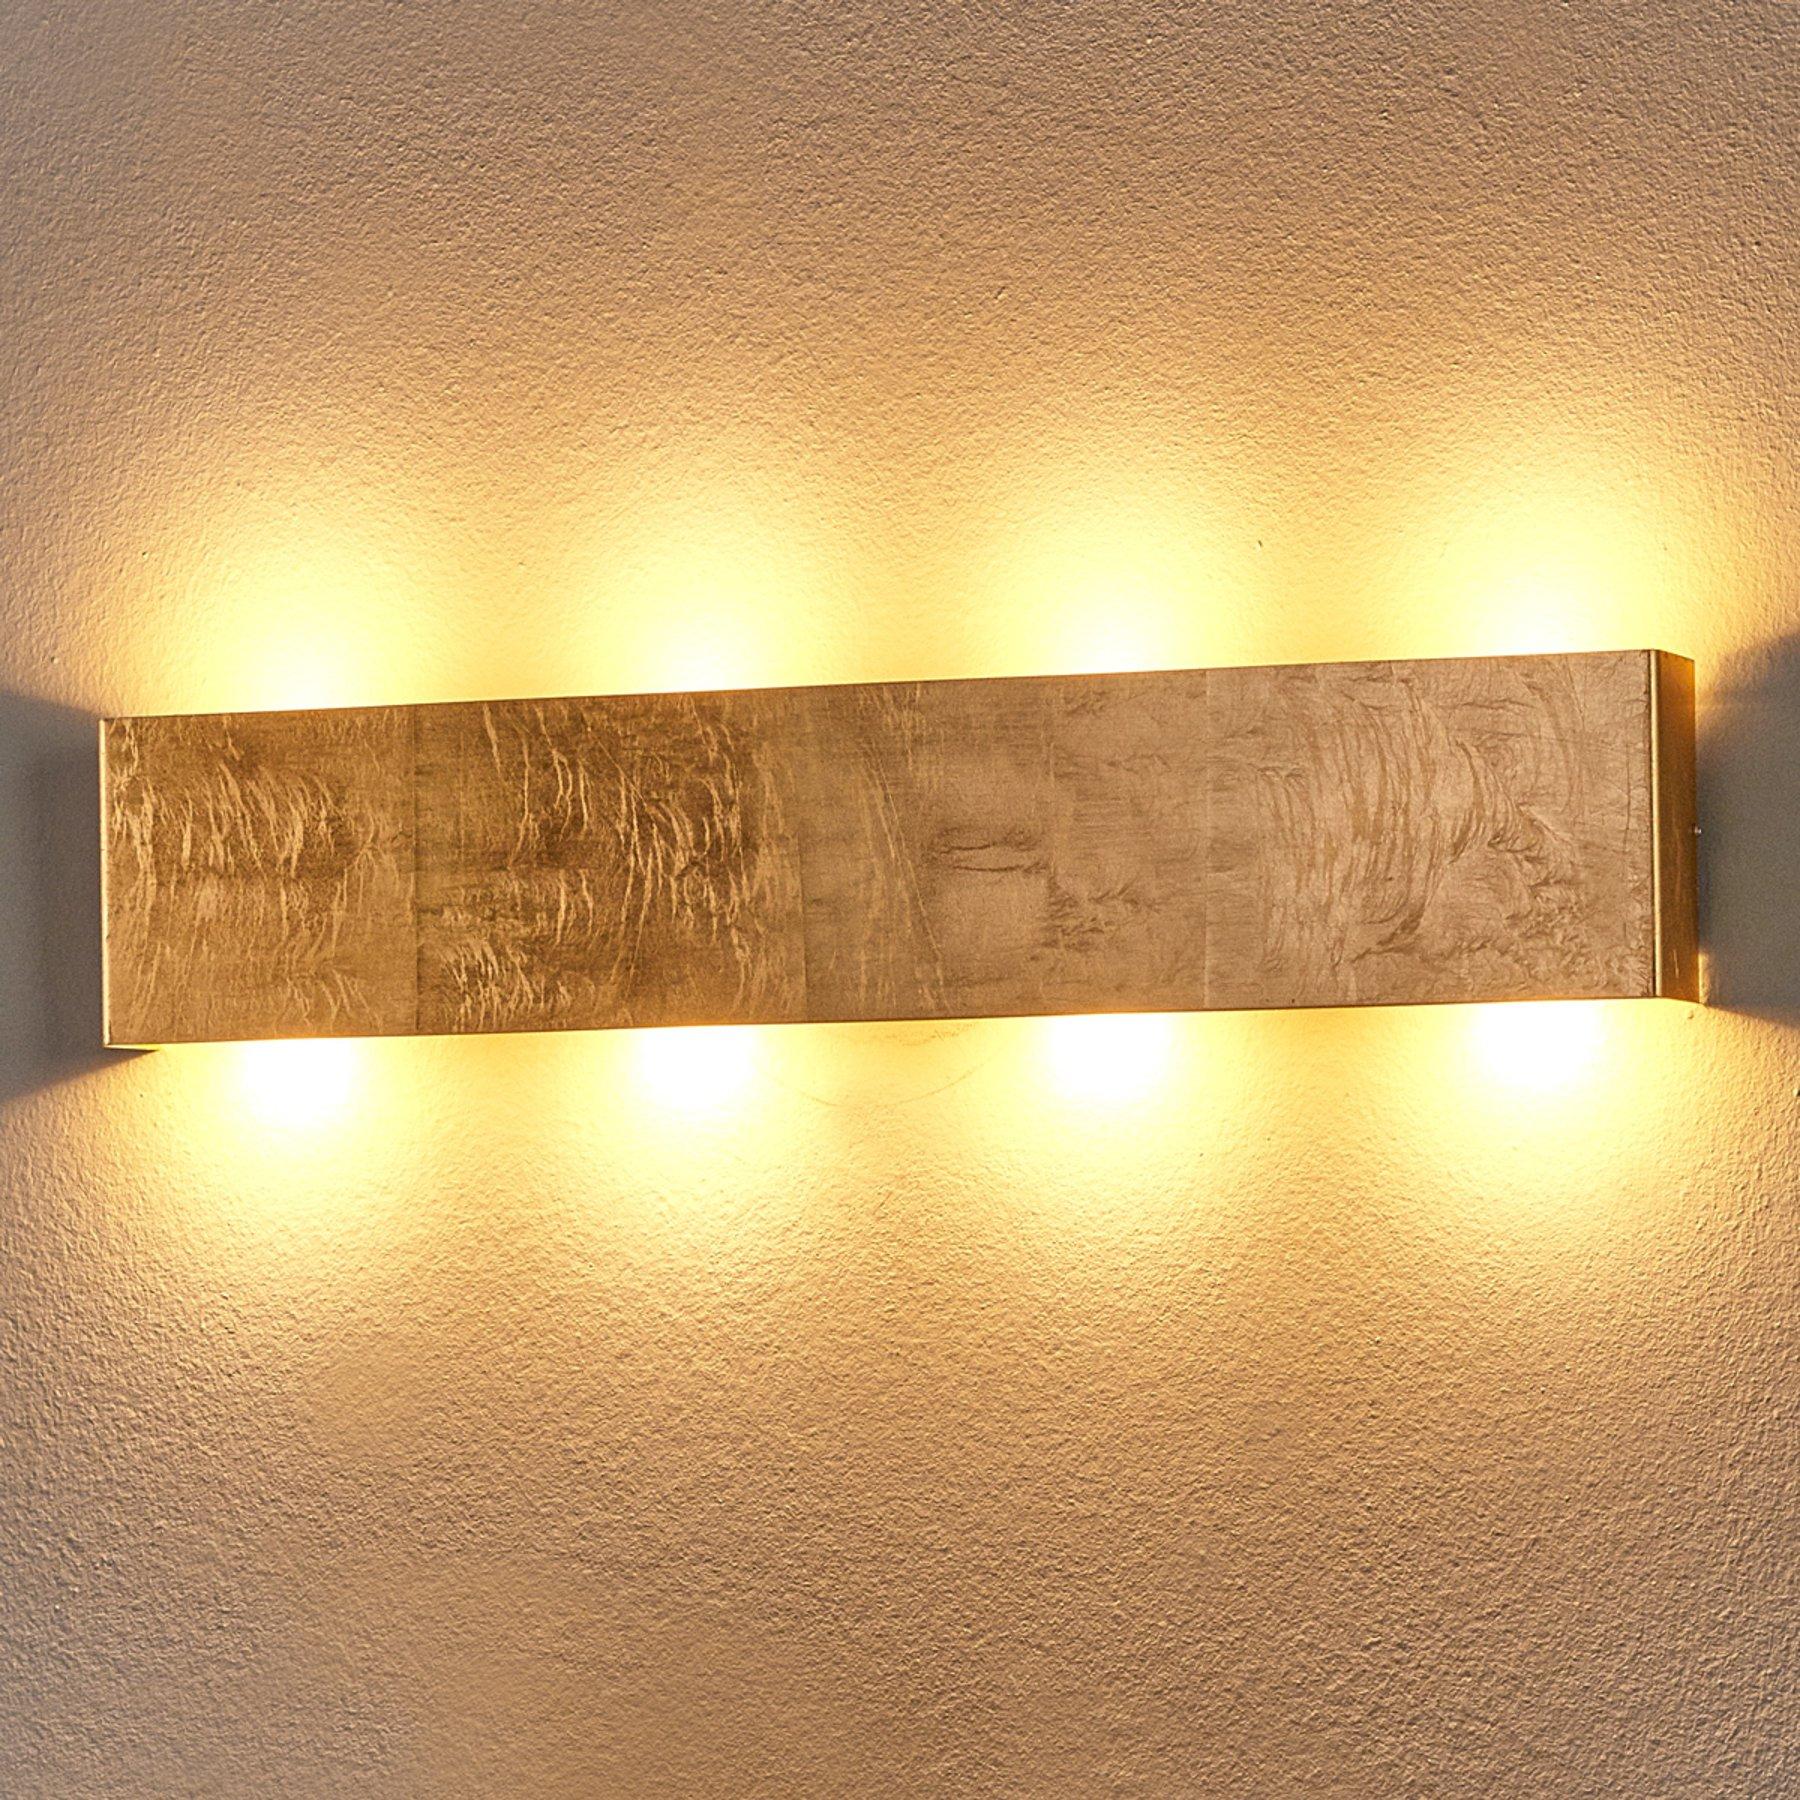 Maja - antikk gullfarget LED-vegglampe, dimbar